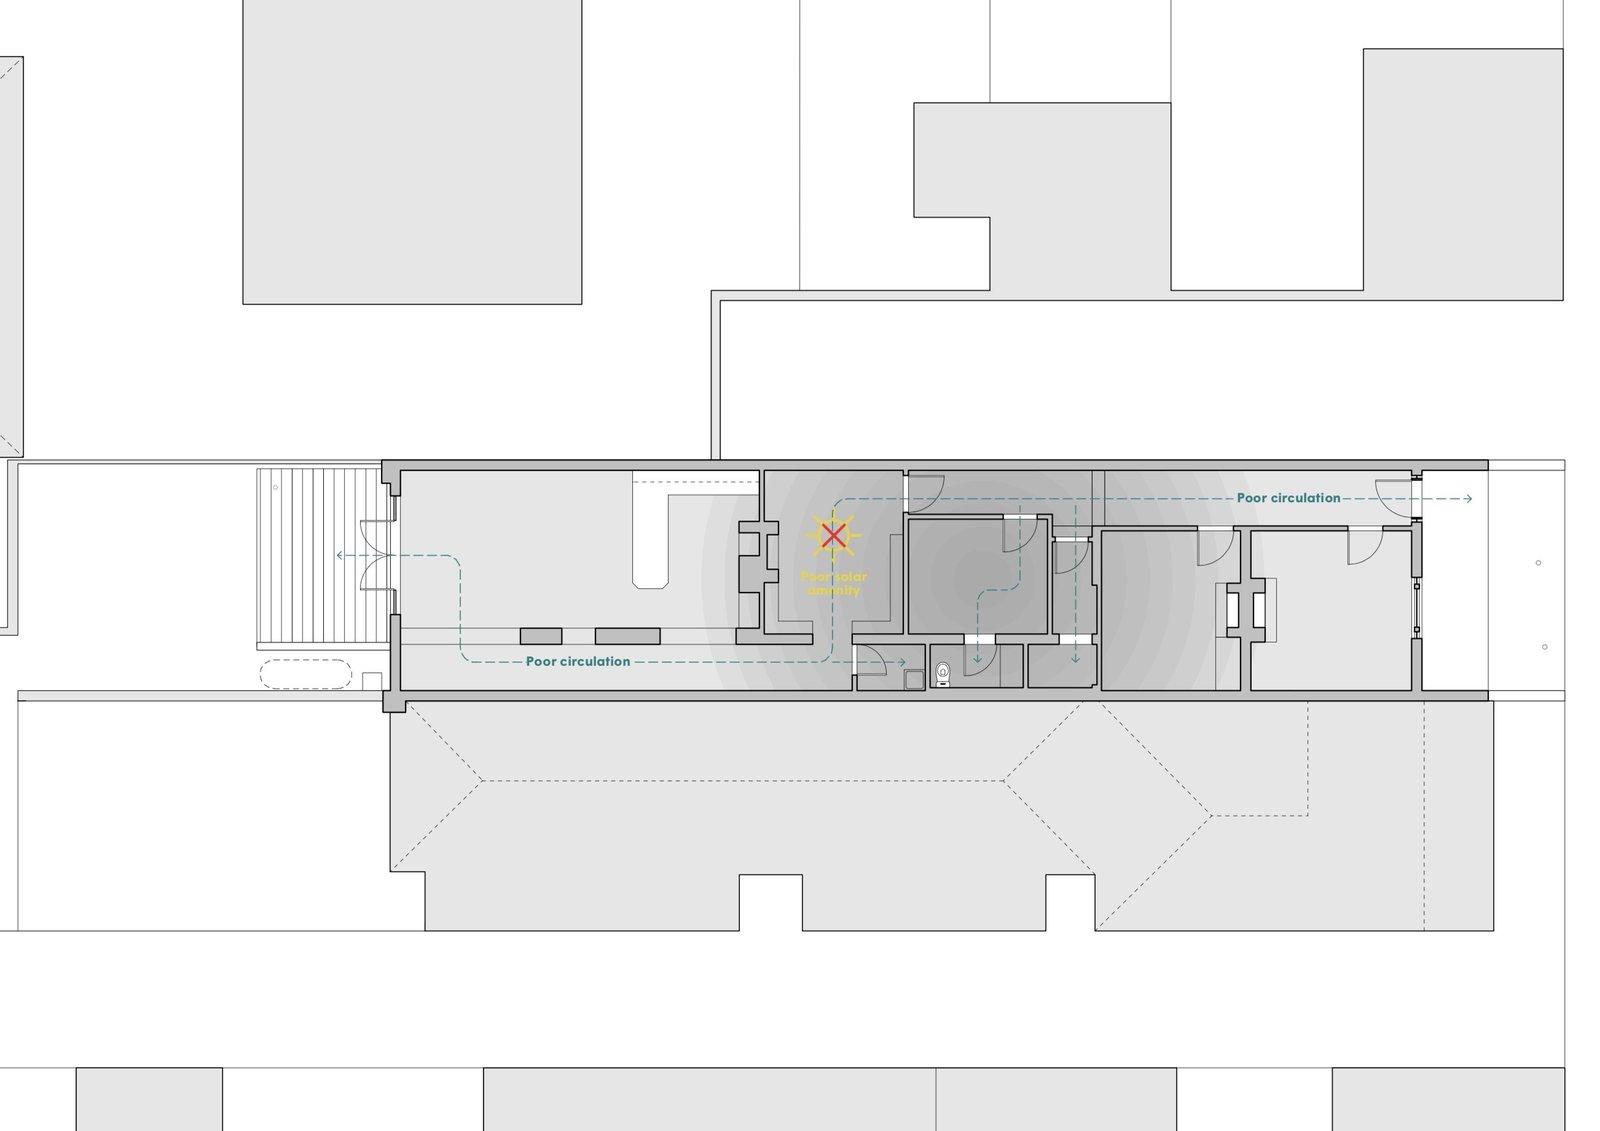 Grant House original floor plan